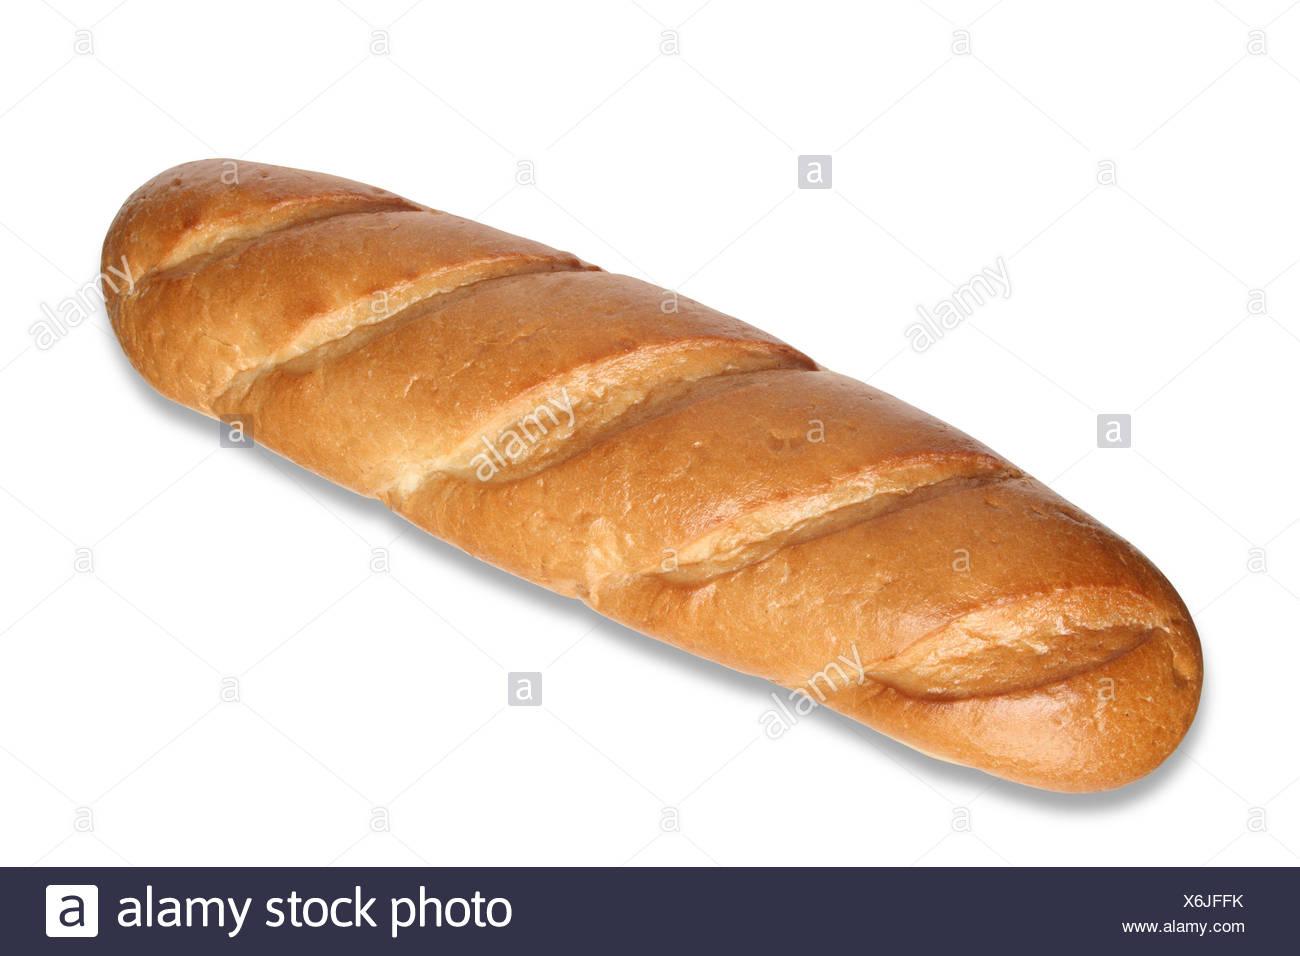 White Bread - Stock Image